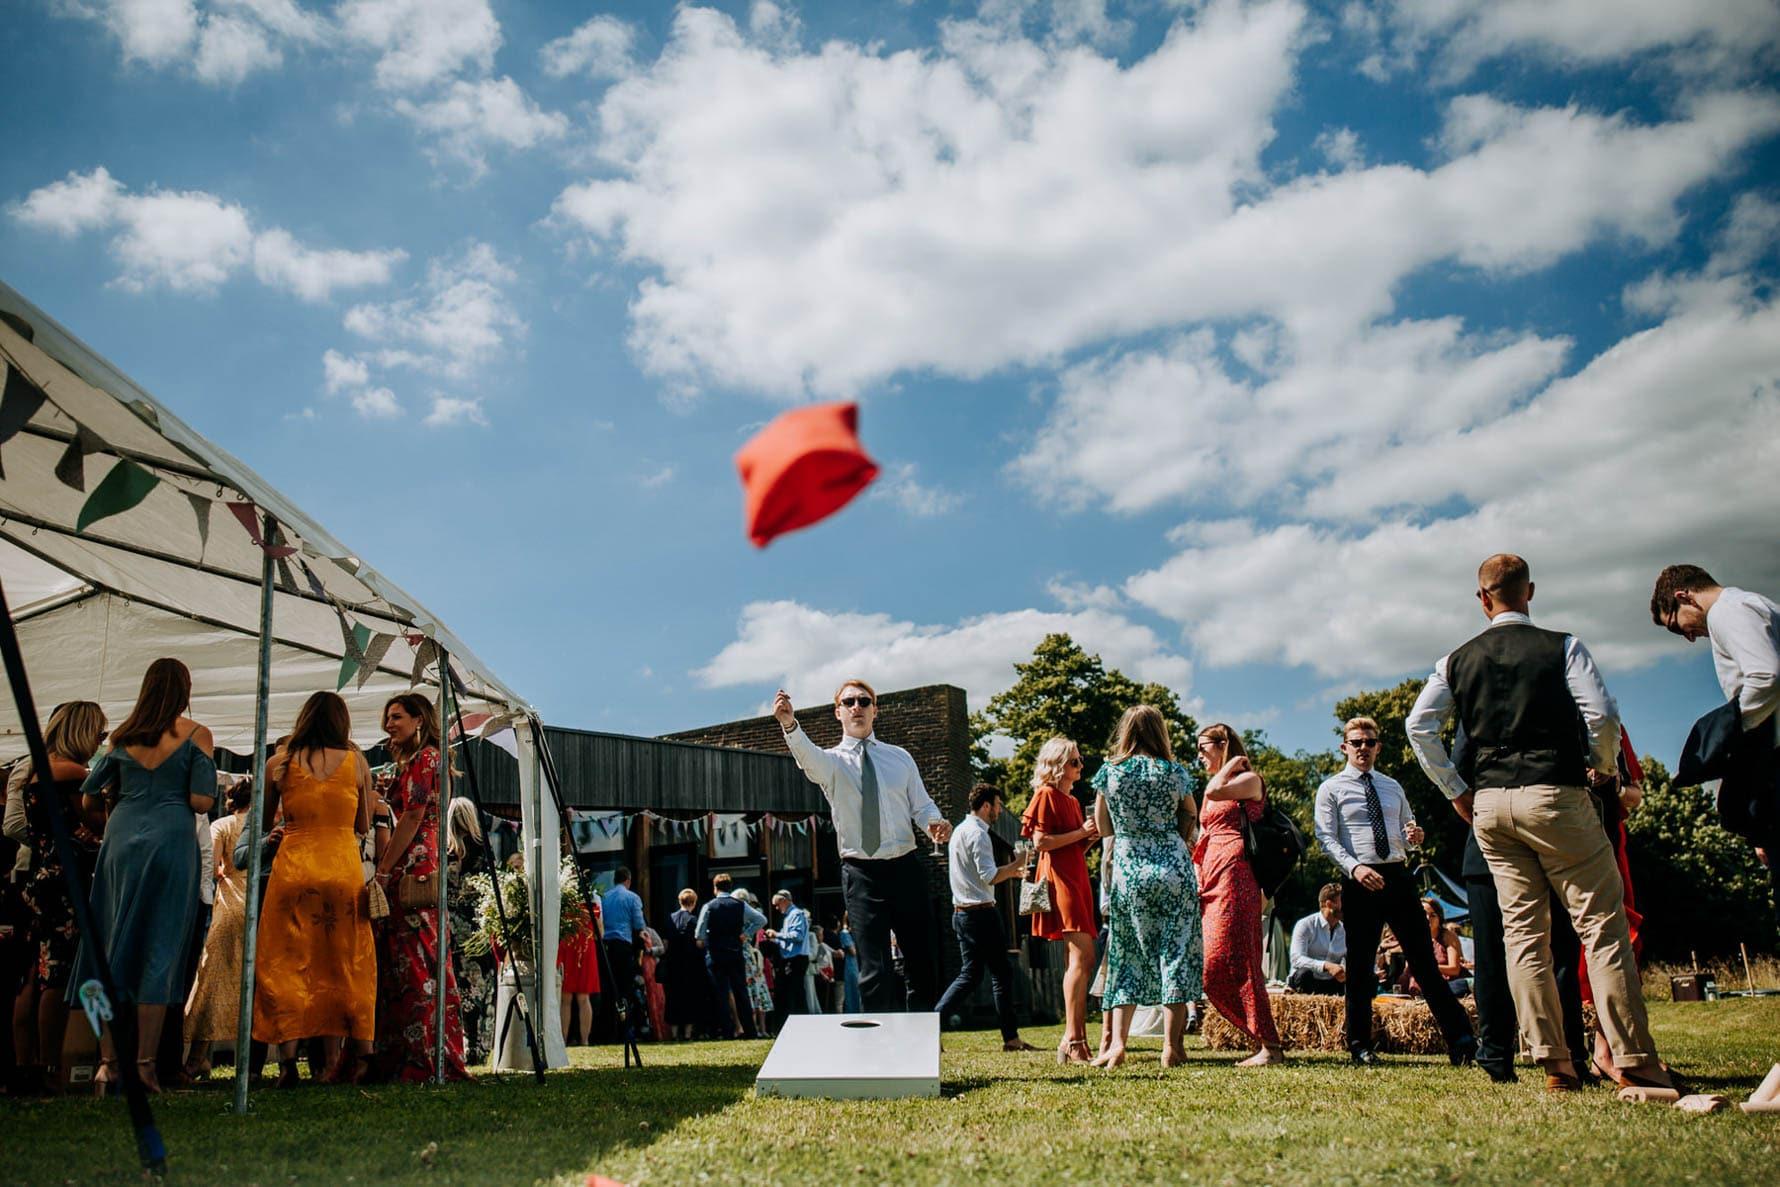 Man throwing a beanbag at a wedding reception